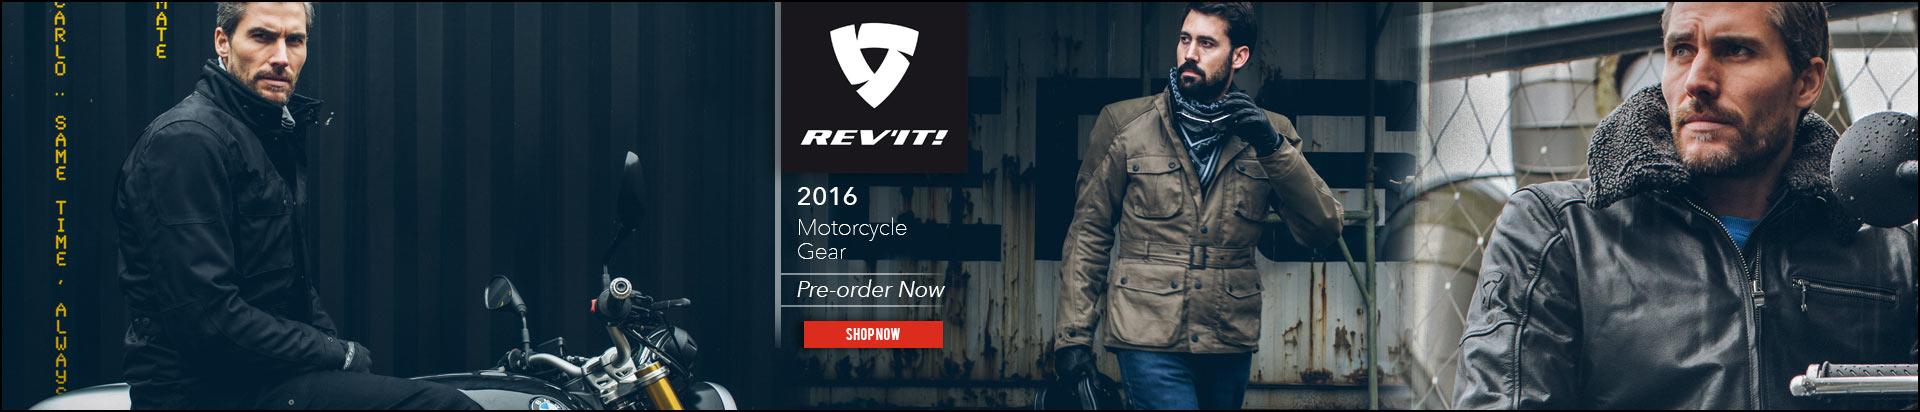 Revit Pre Order 2016